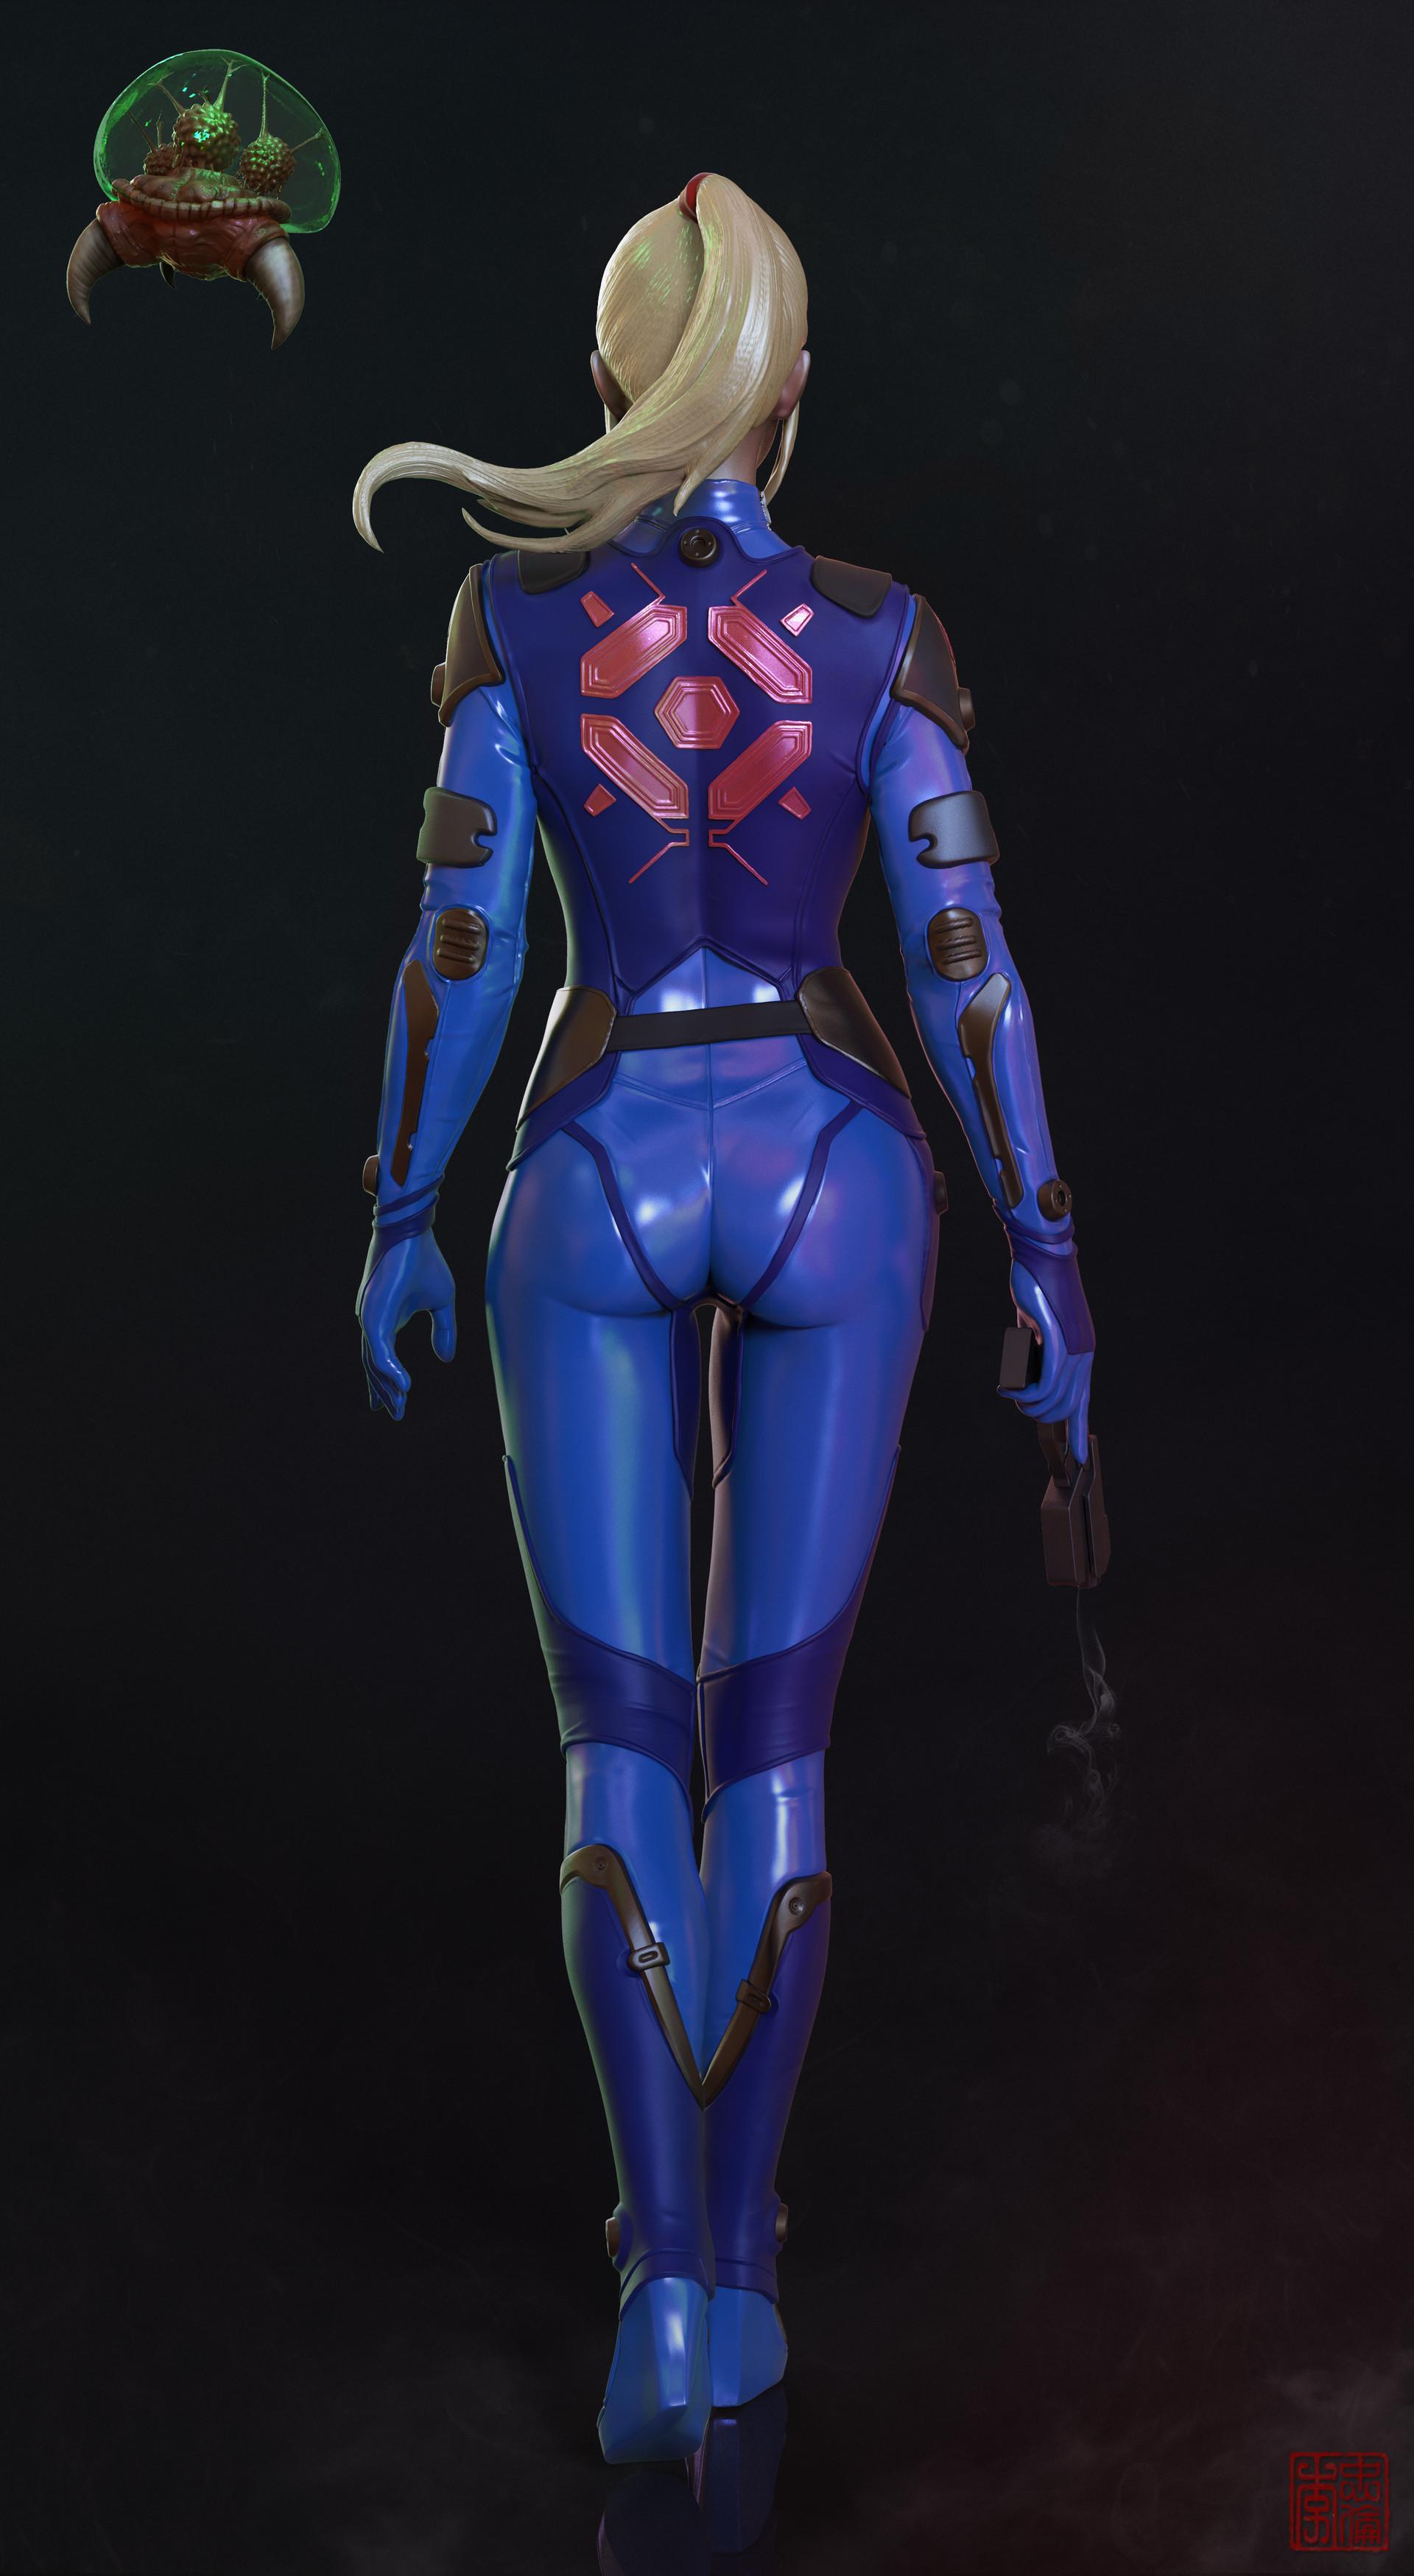 Closeup. Metroid. Zero suit Zbrush sculpt